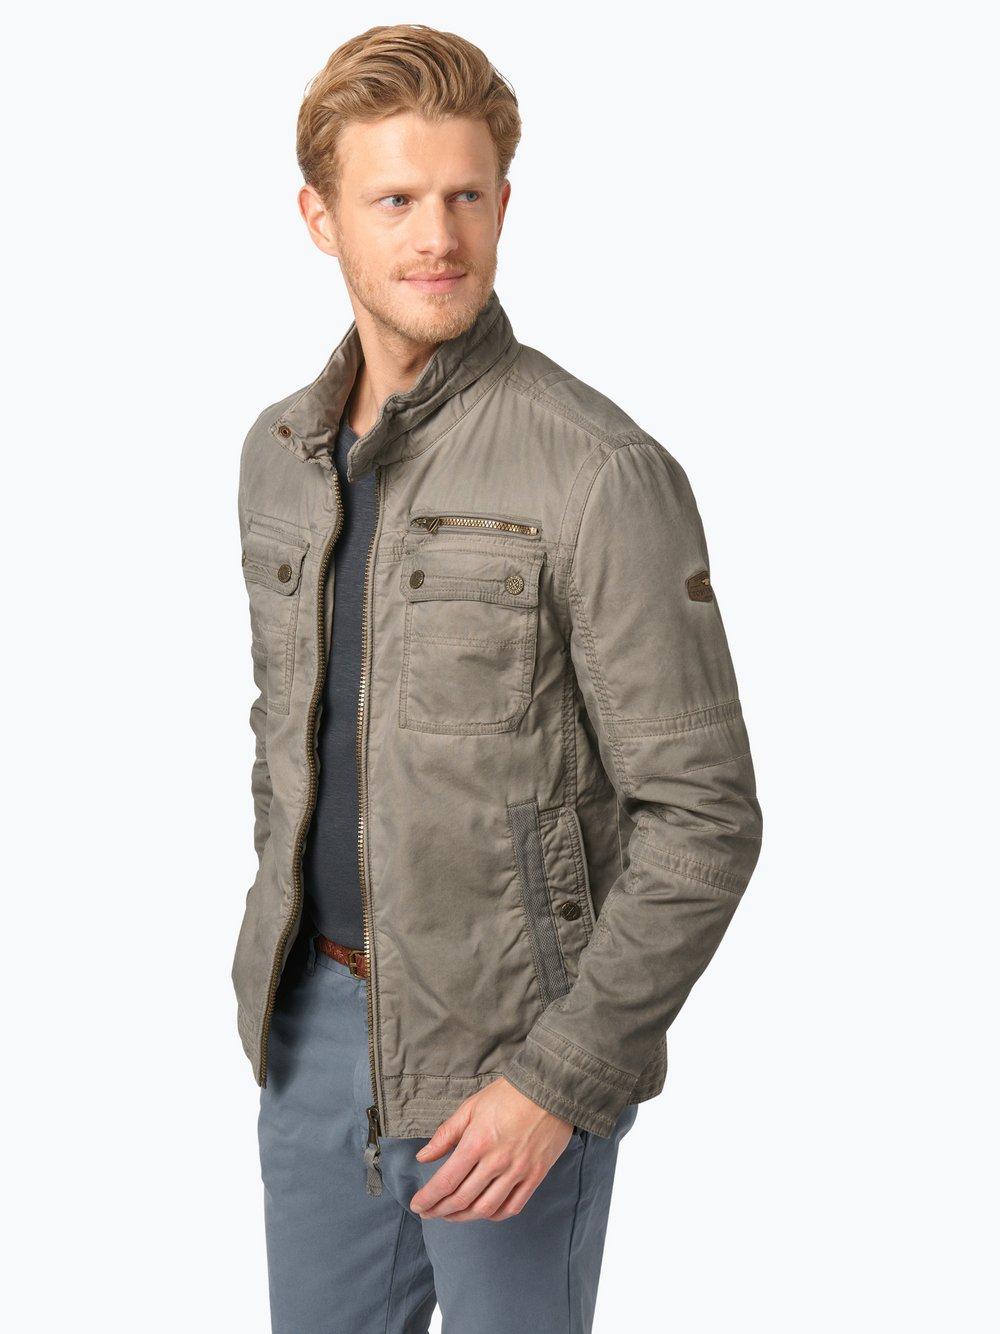 Herren Jacke kaufenVANGRAAF Tom Tailor online COM 8nwm0vN